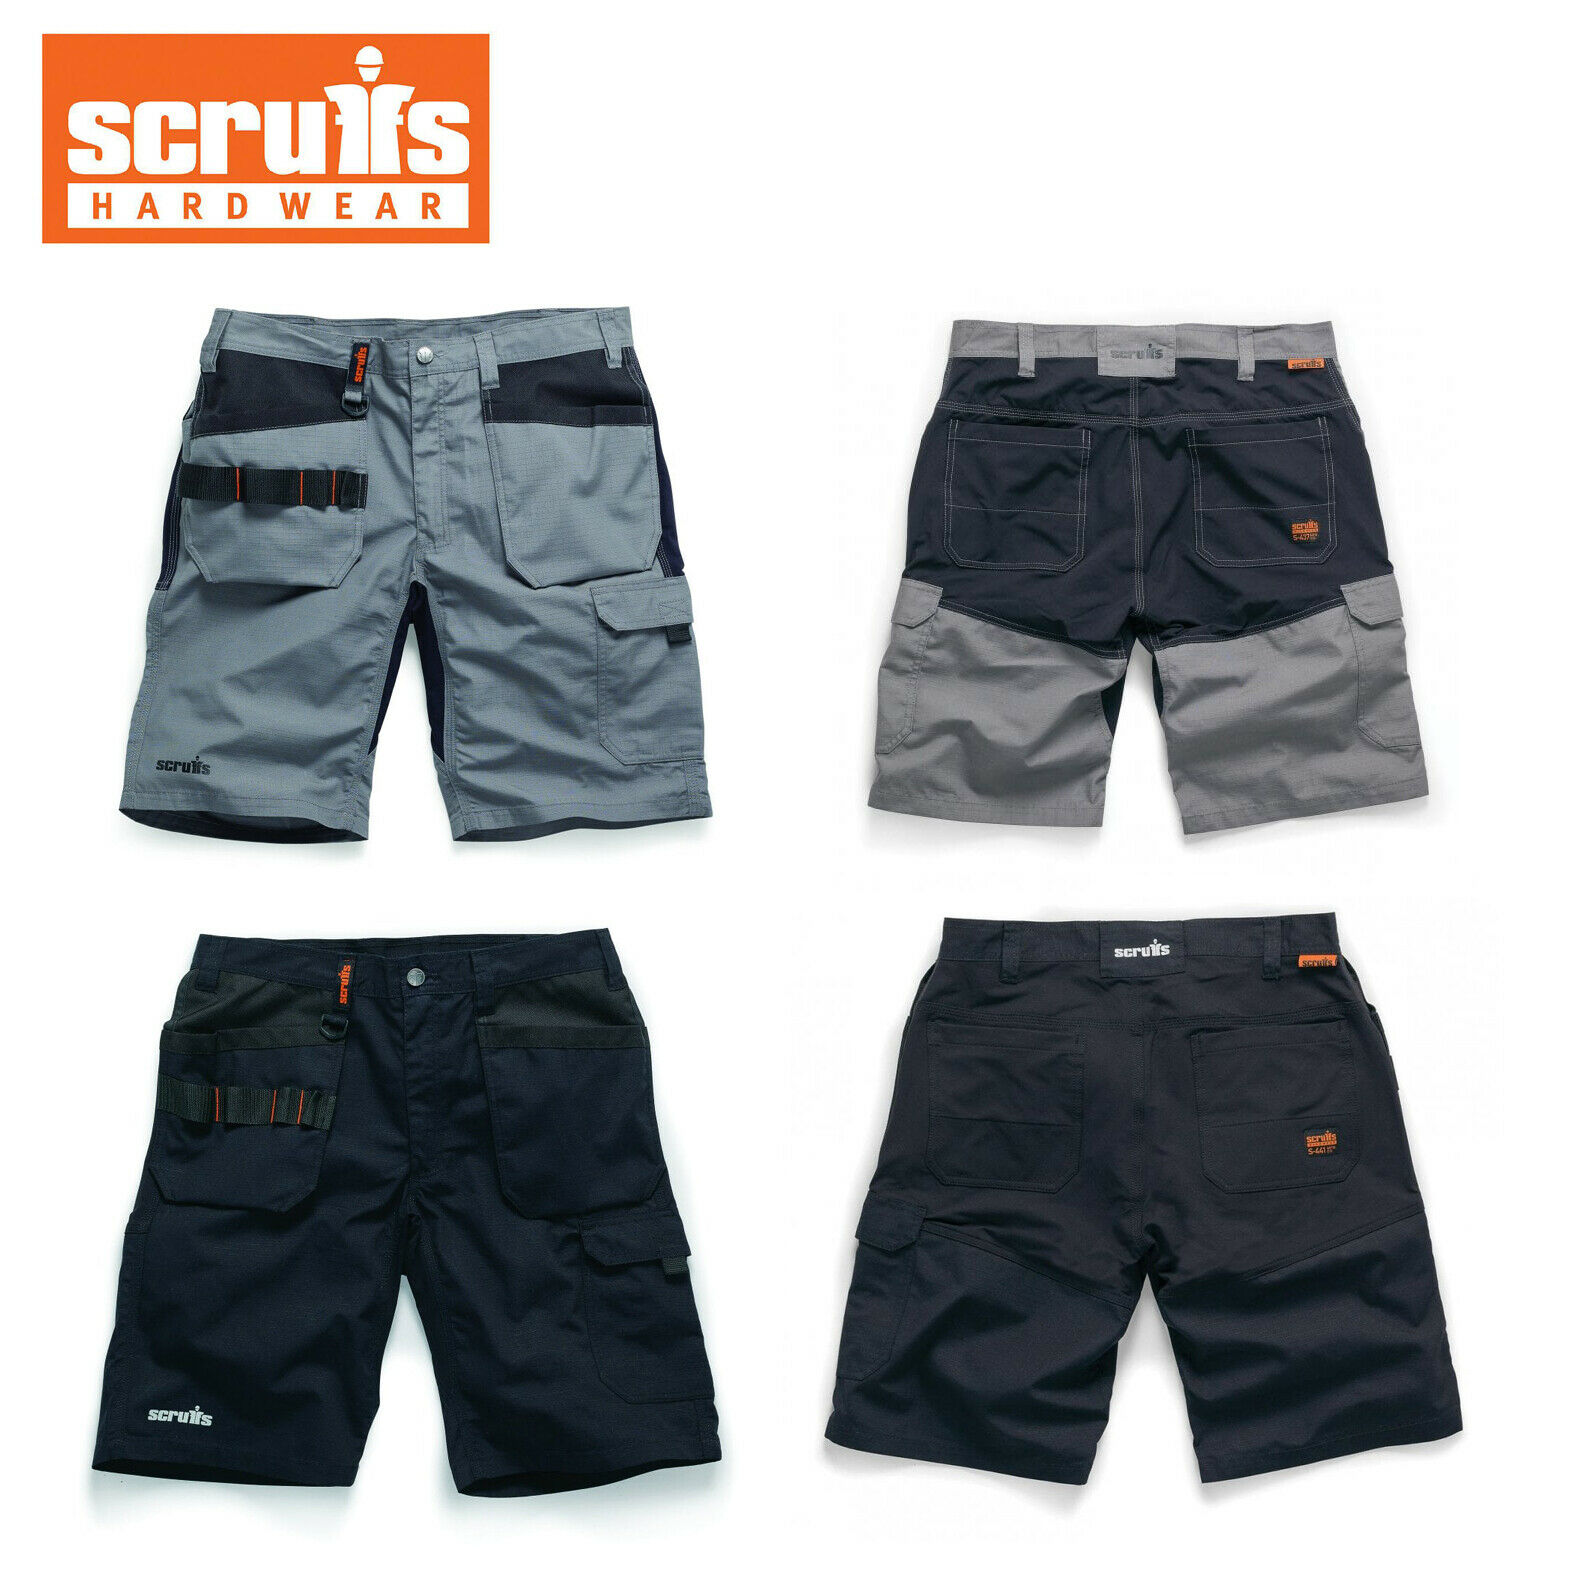 Scruffs TRADE FLEX HOLSTER SHORTS Lightweight Slim Fit Hard Wearing Work Shorts